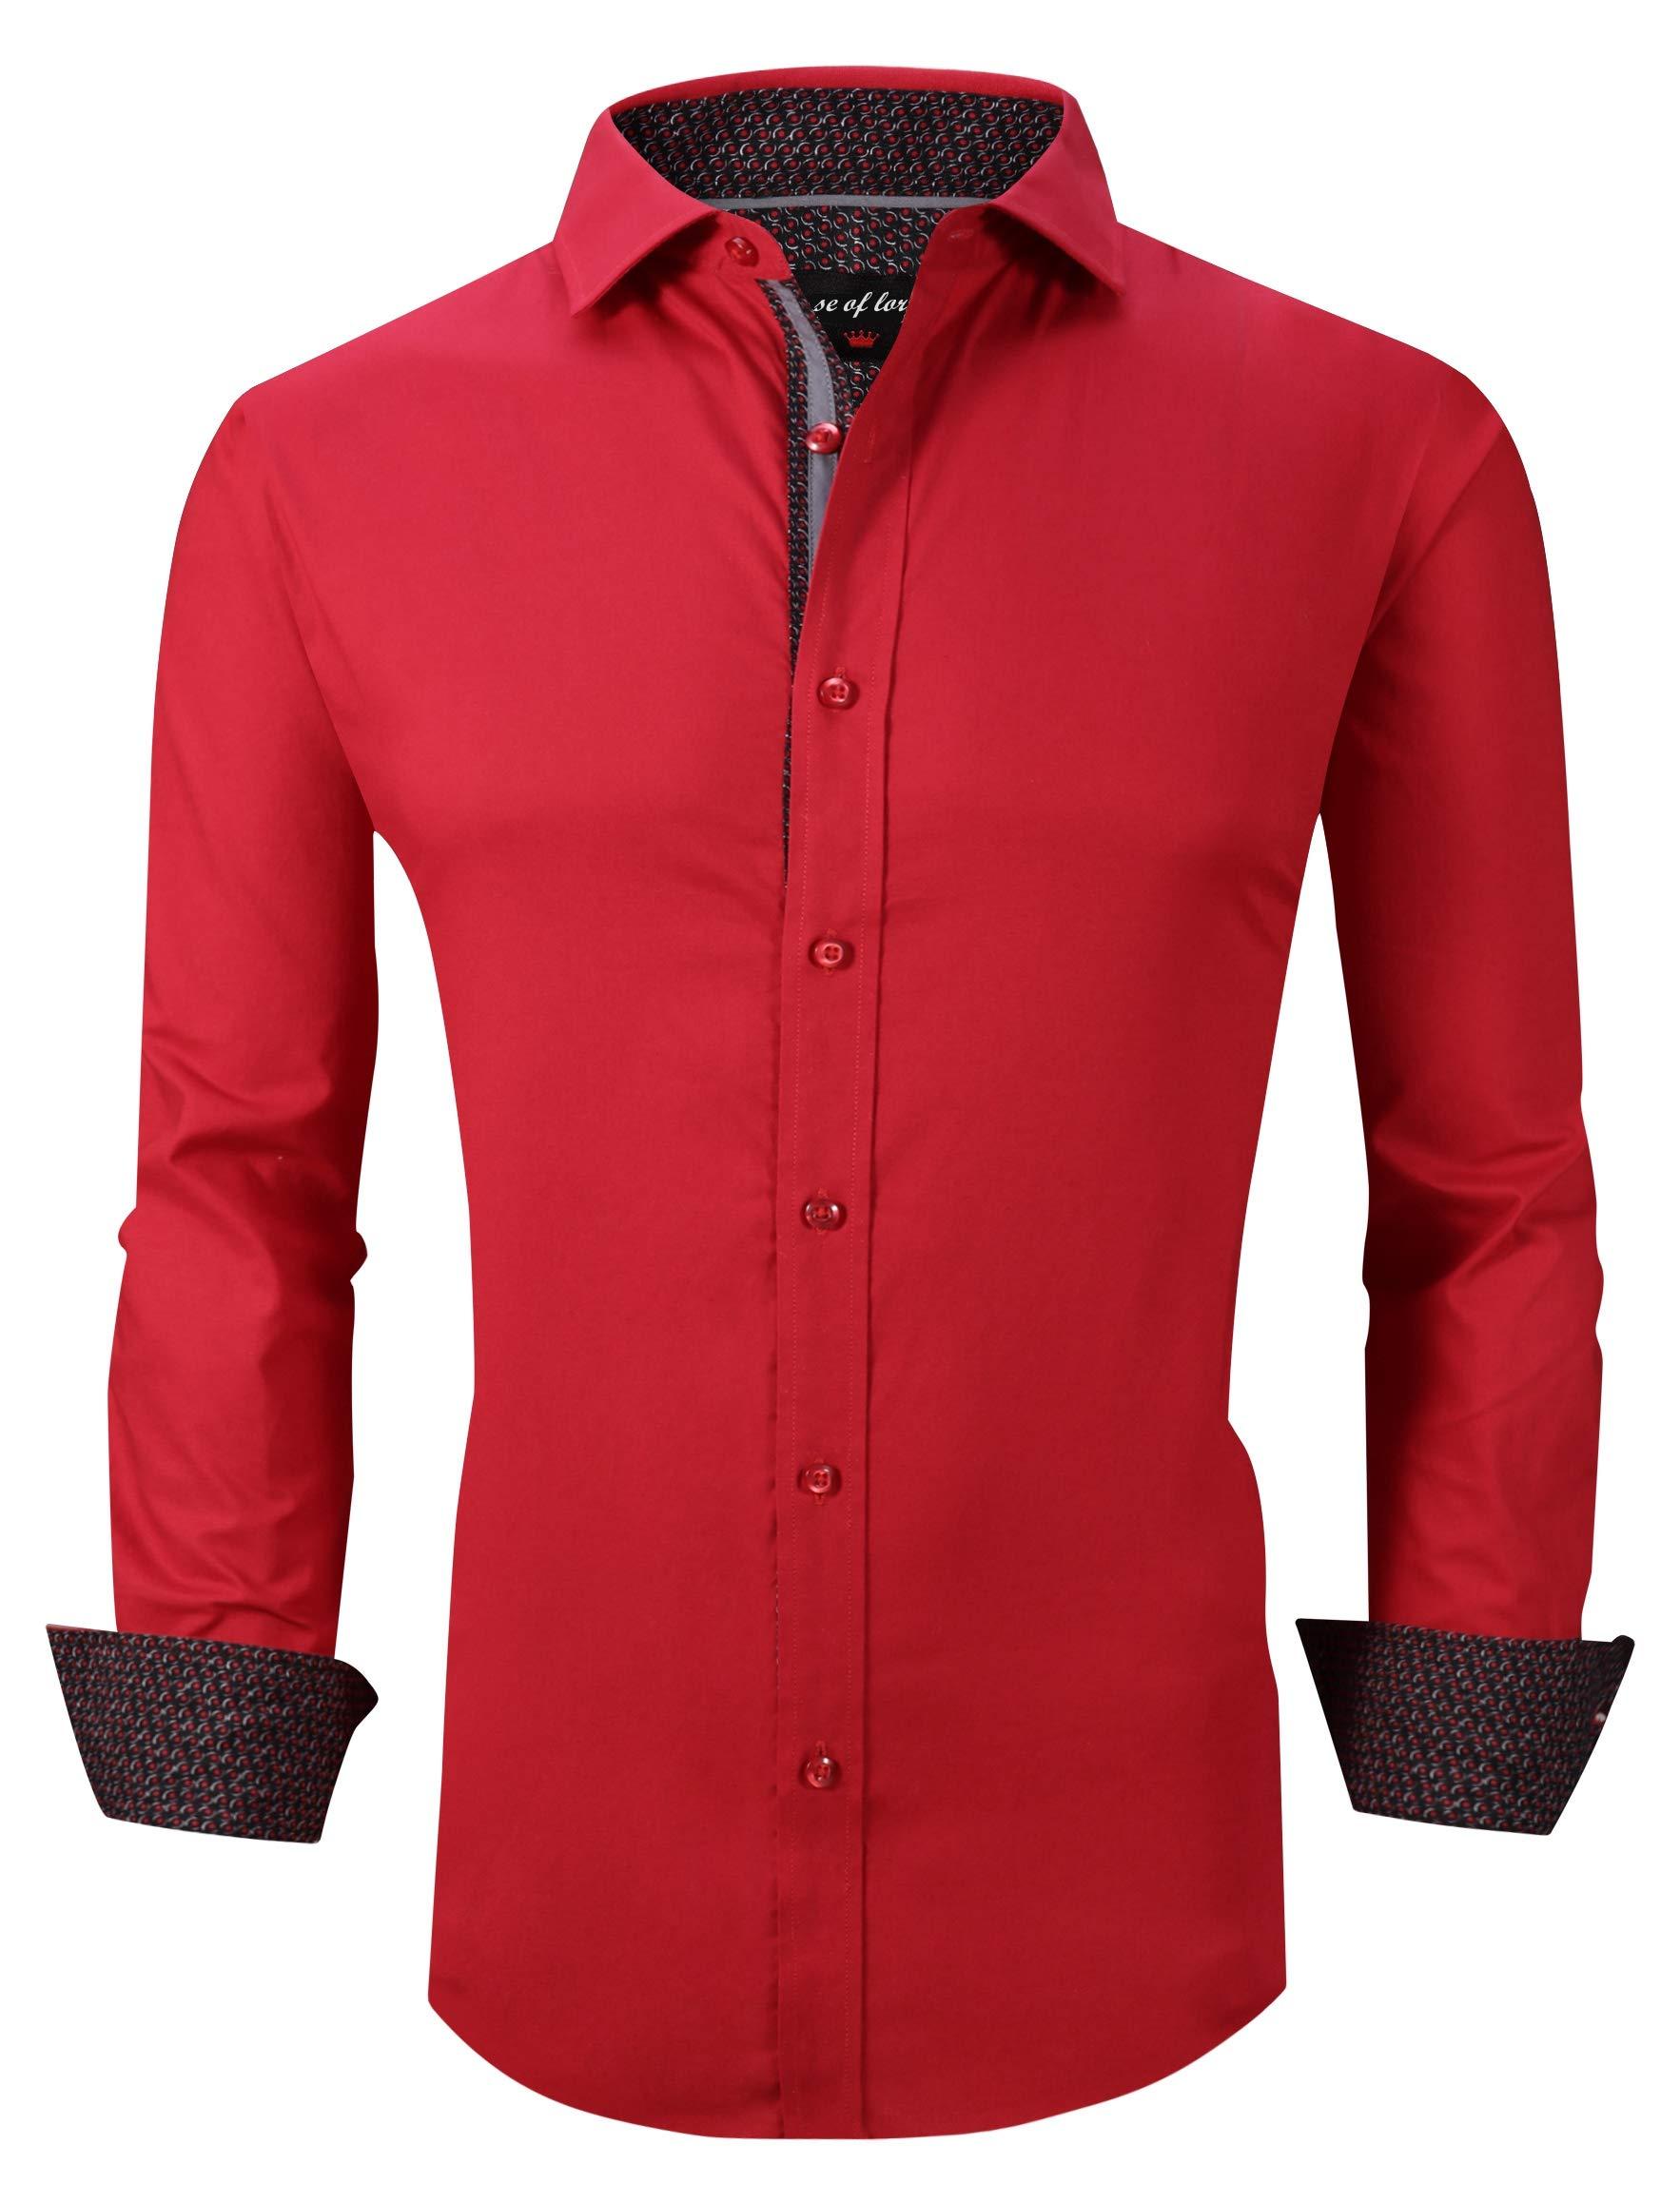 Mens Dress Shirts Long Sleeve Regular Fit Casual Button Down Shirts Red XXL